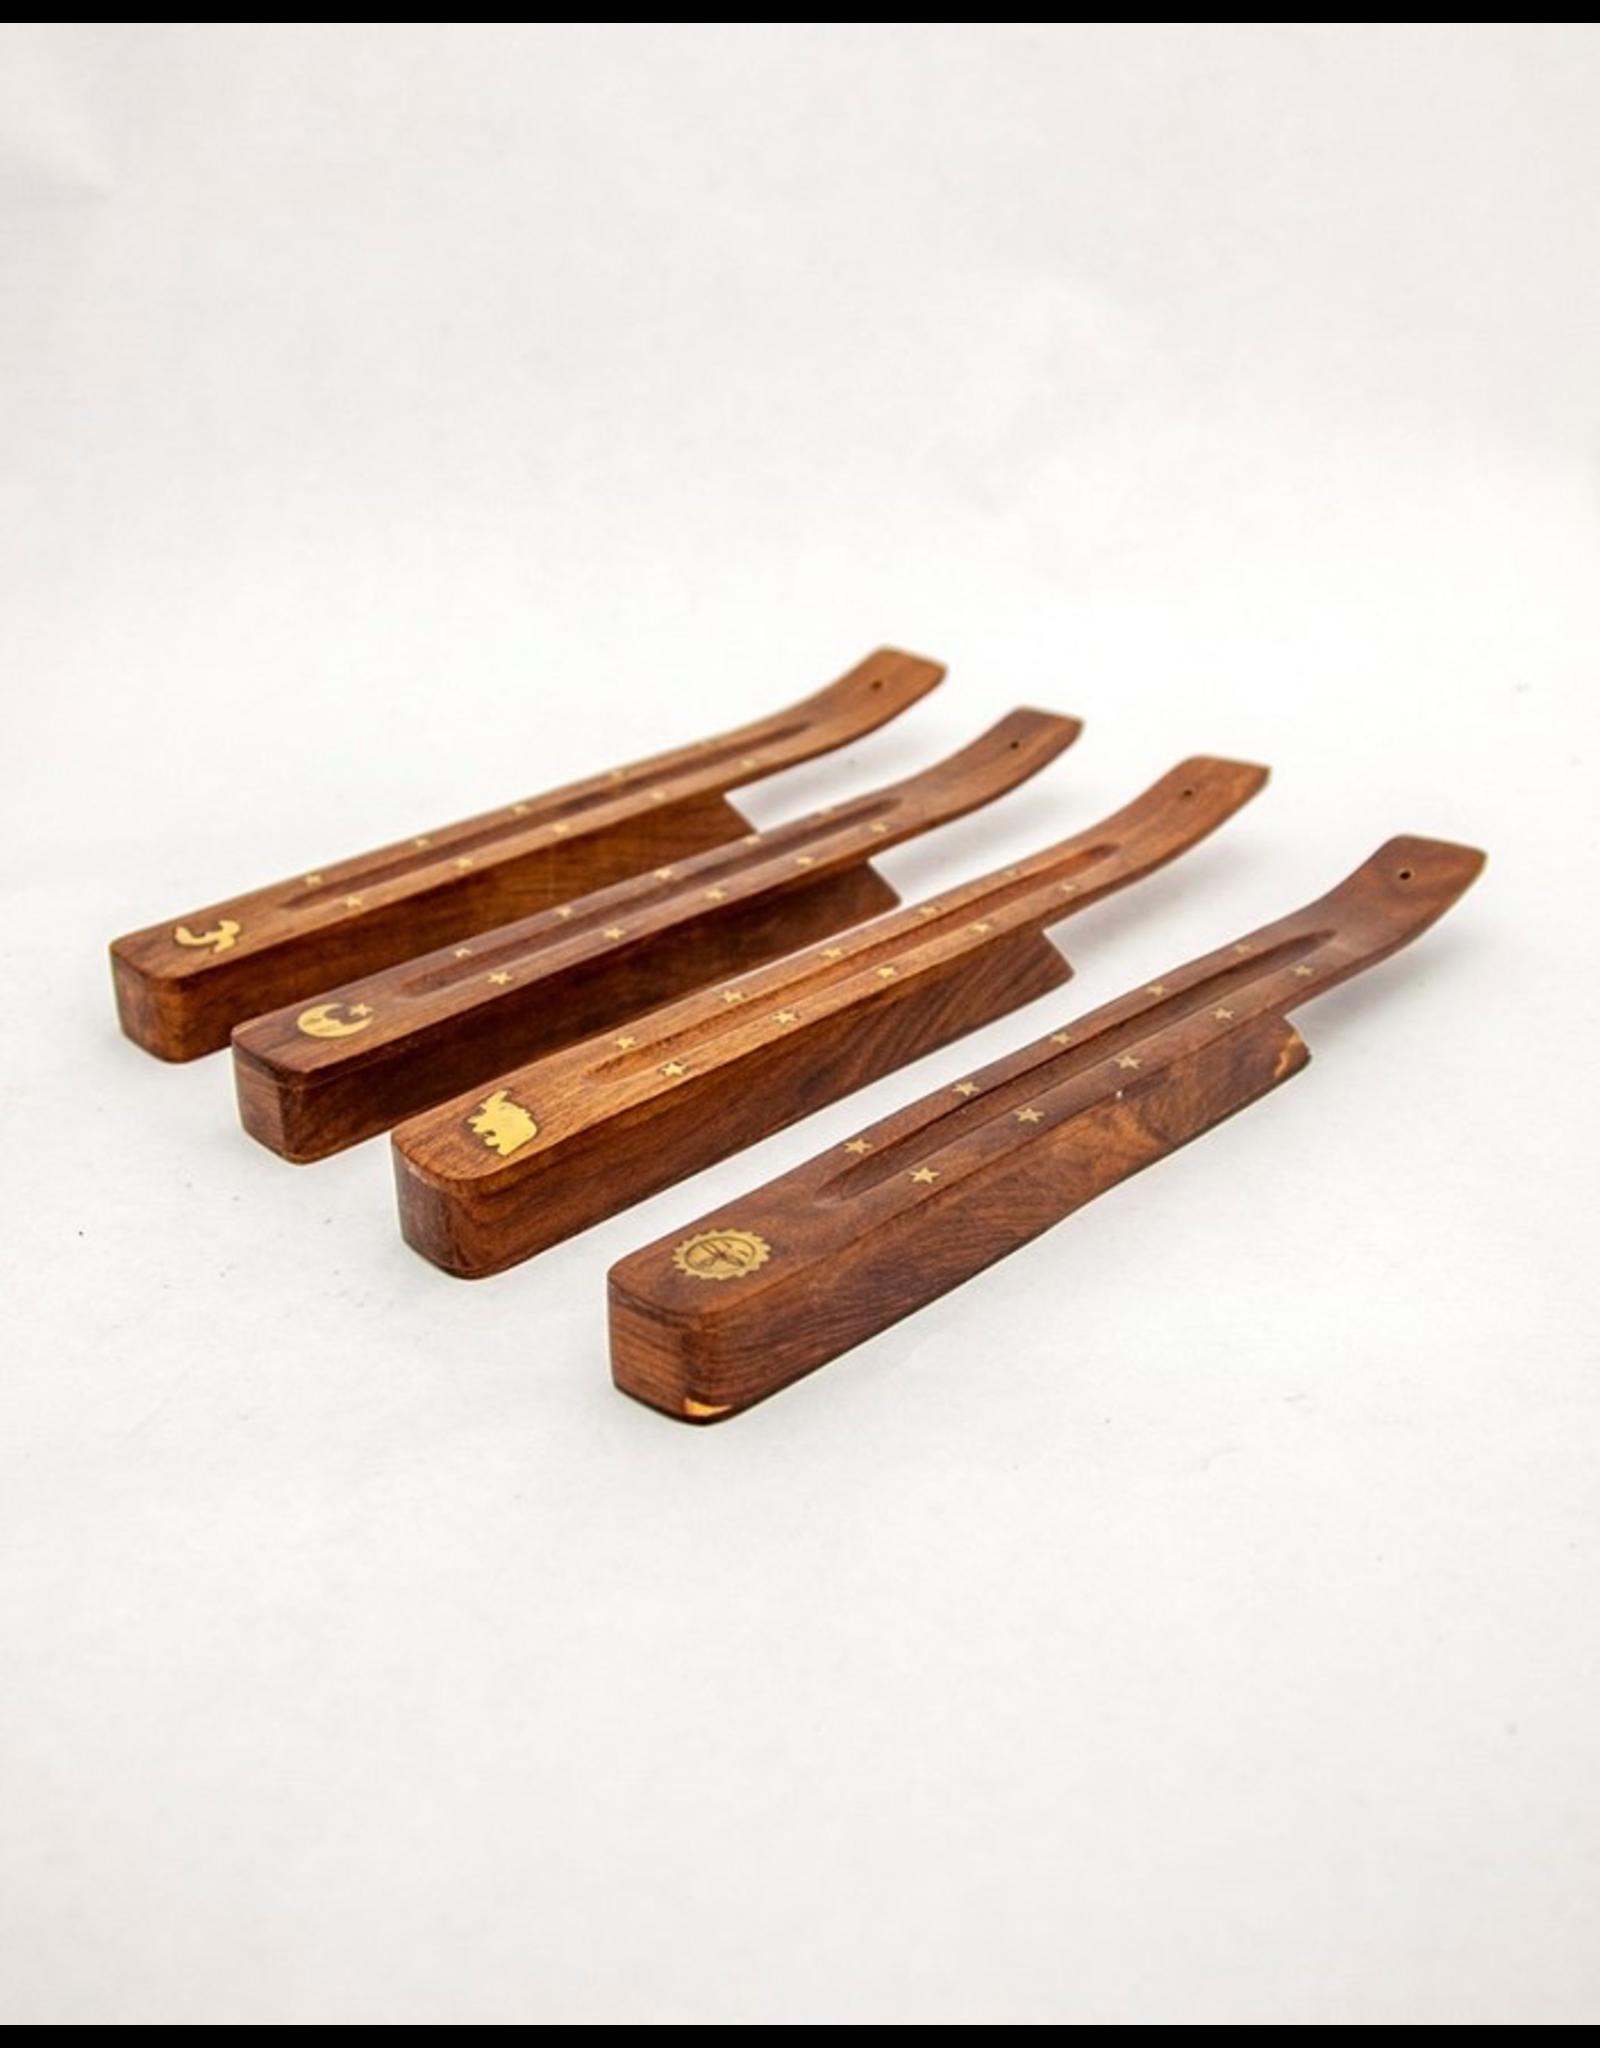 Shisham Wood Box Ash Catcher with Brass Inlay